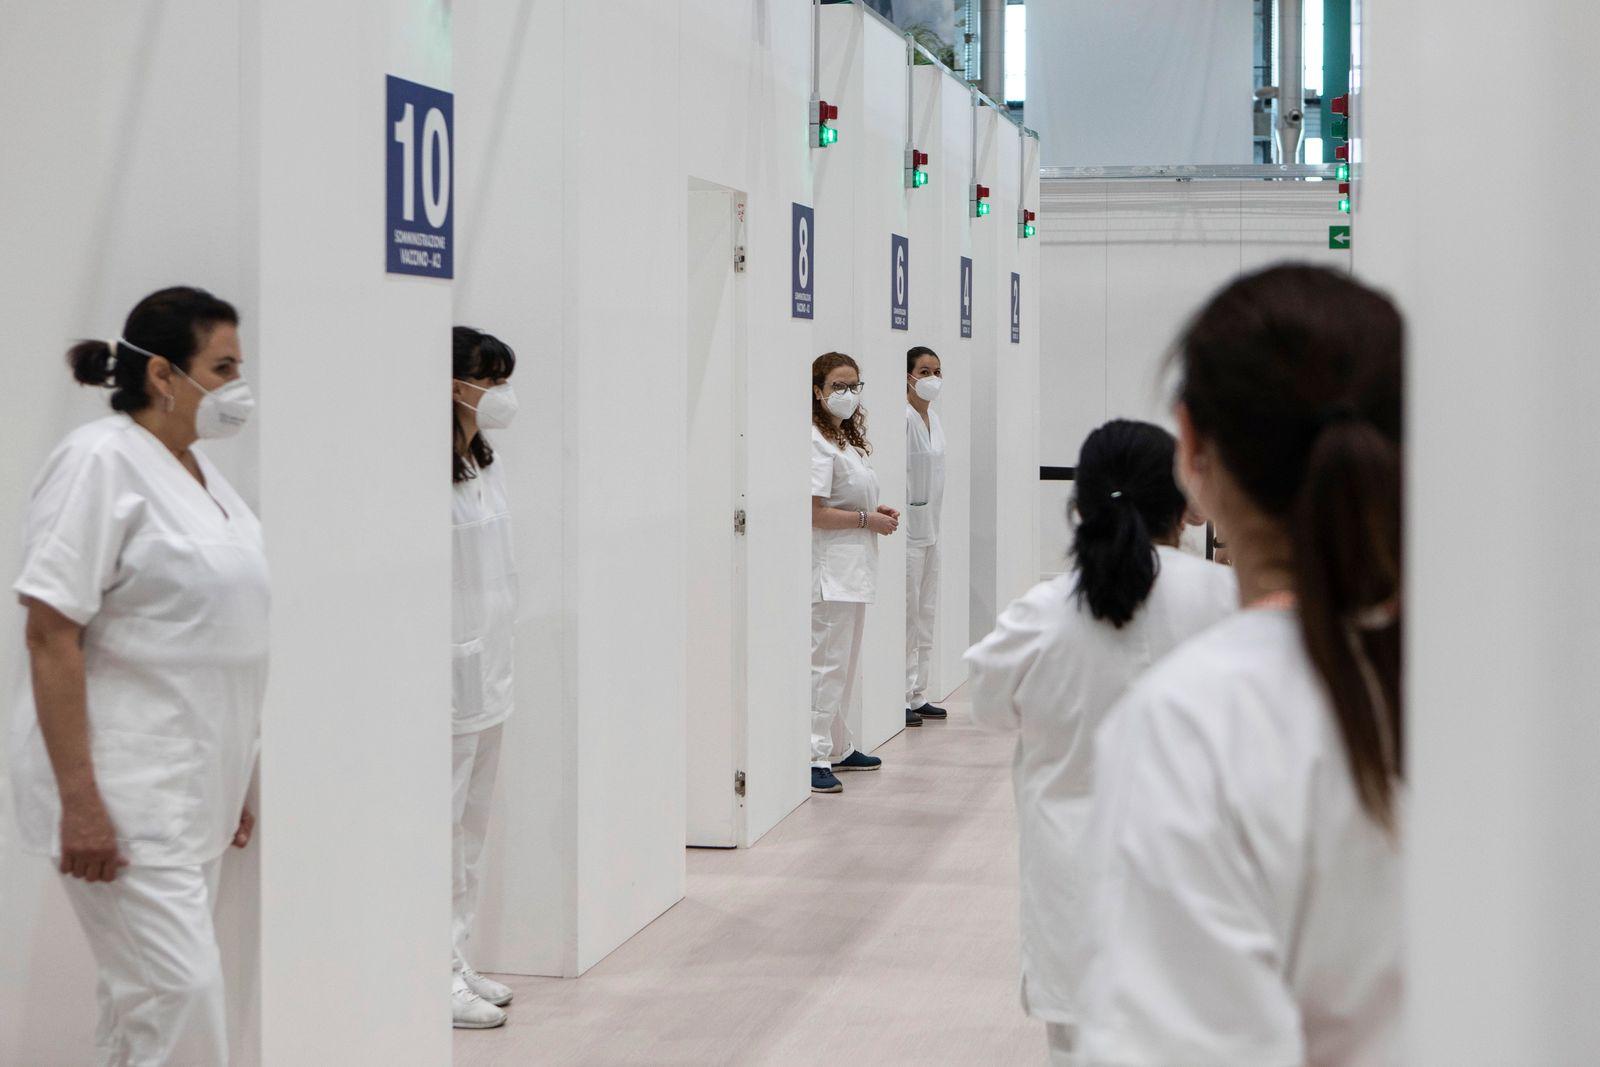 Milan Opens Mass Covid-19 Vaccination Centre